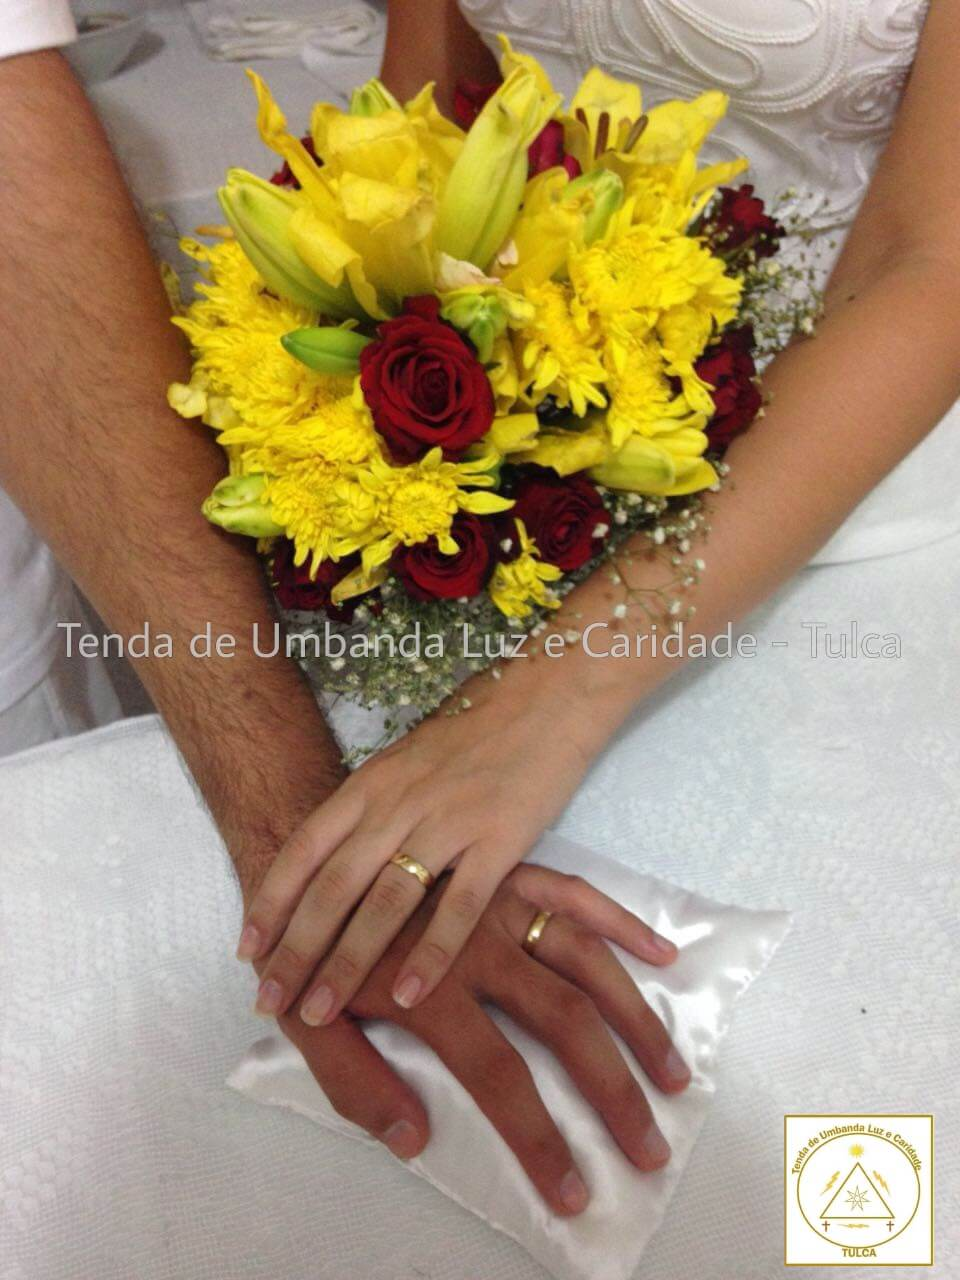 Casamento na Umbanda - Tulca